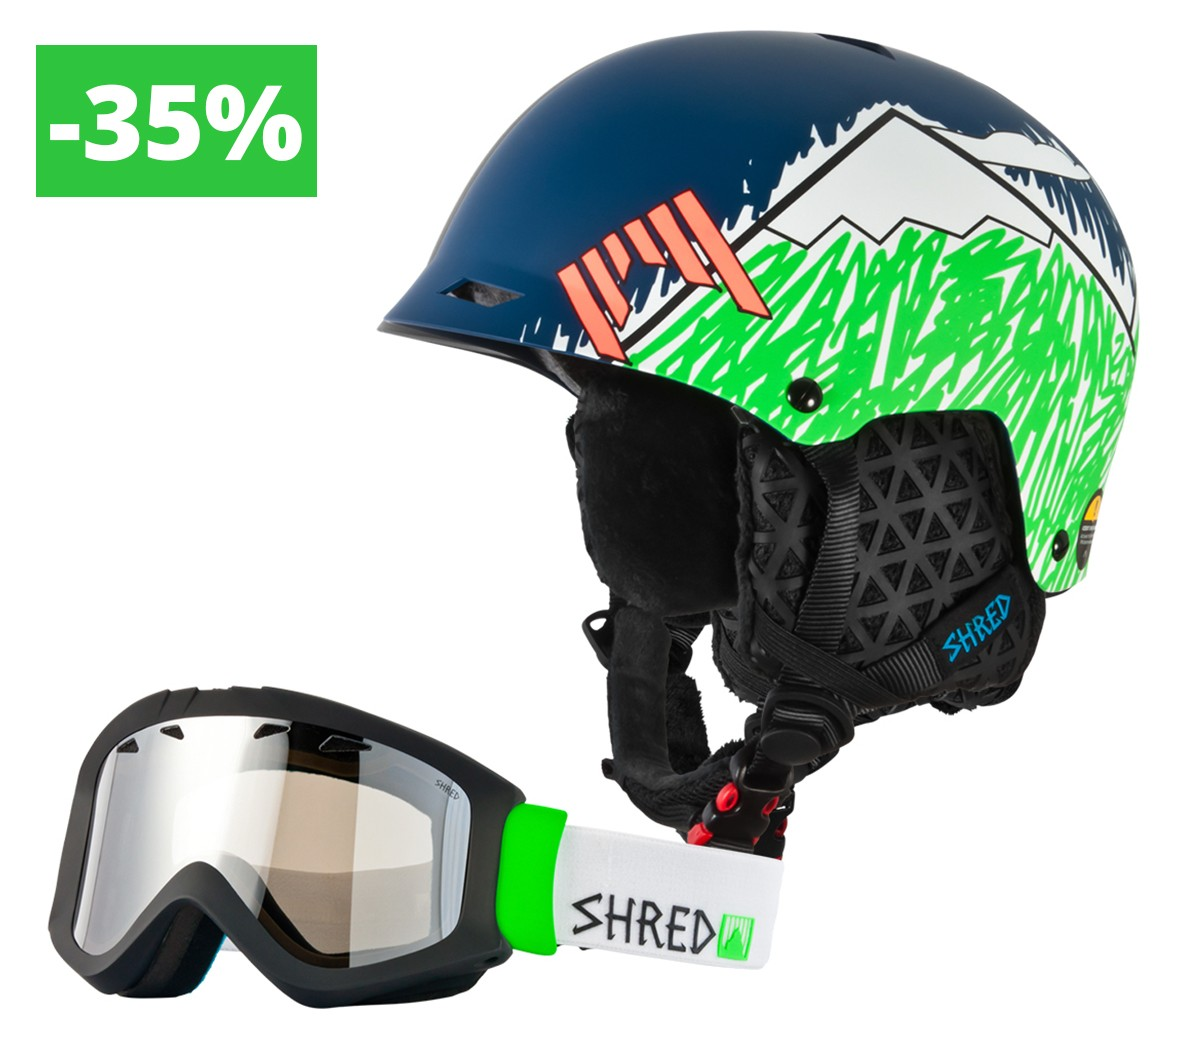 Shred komplet Half Brain D-Lux NeedMoreSnow + Tastic BRO